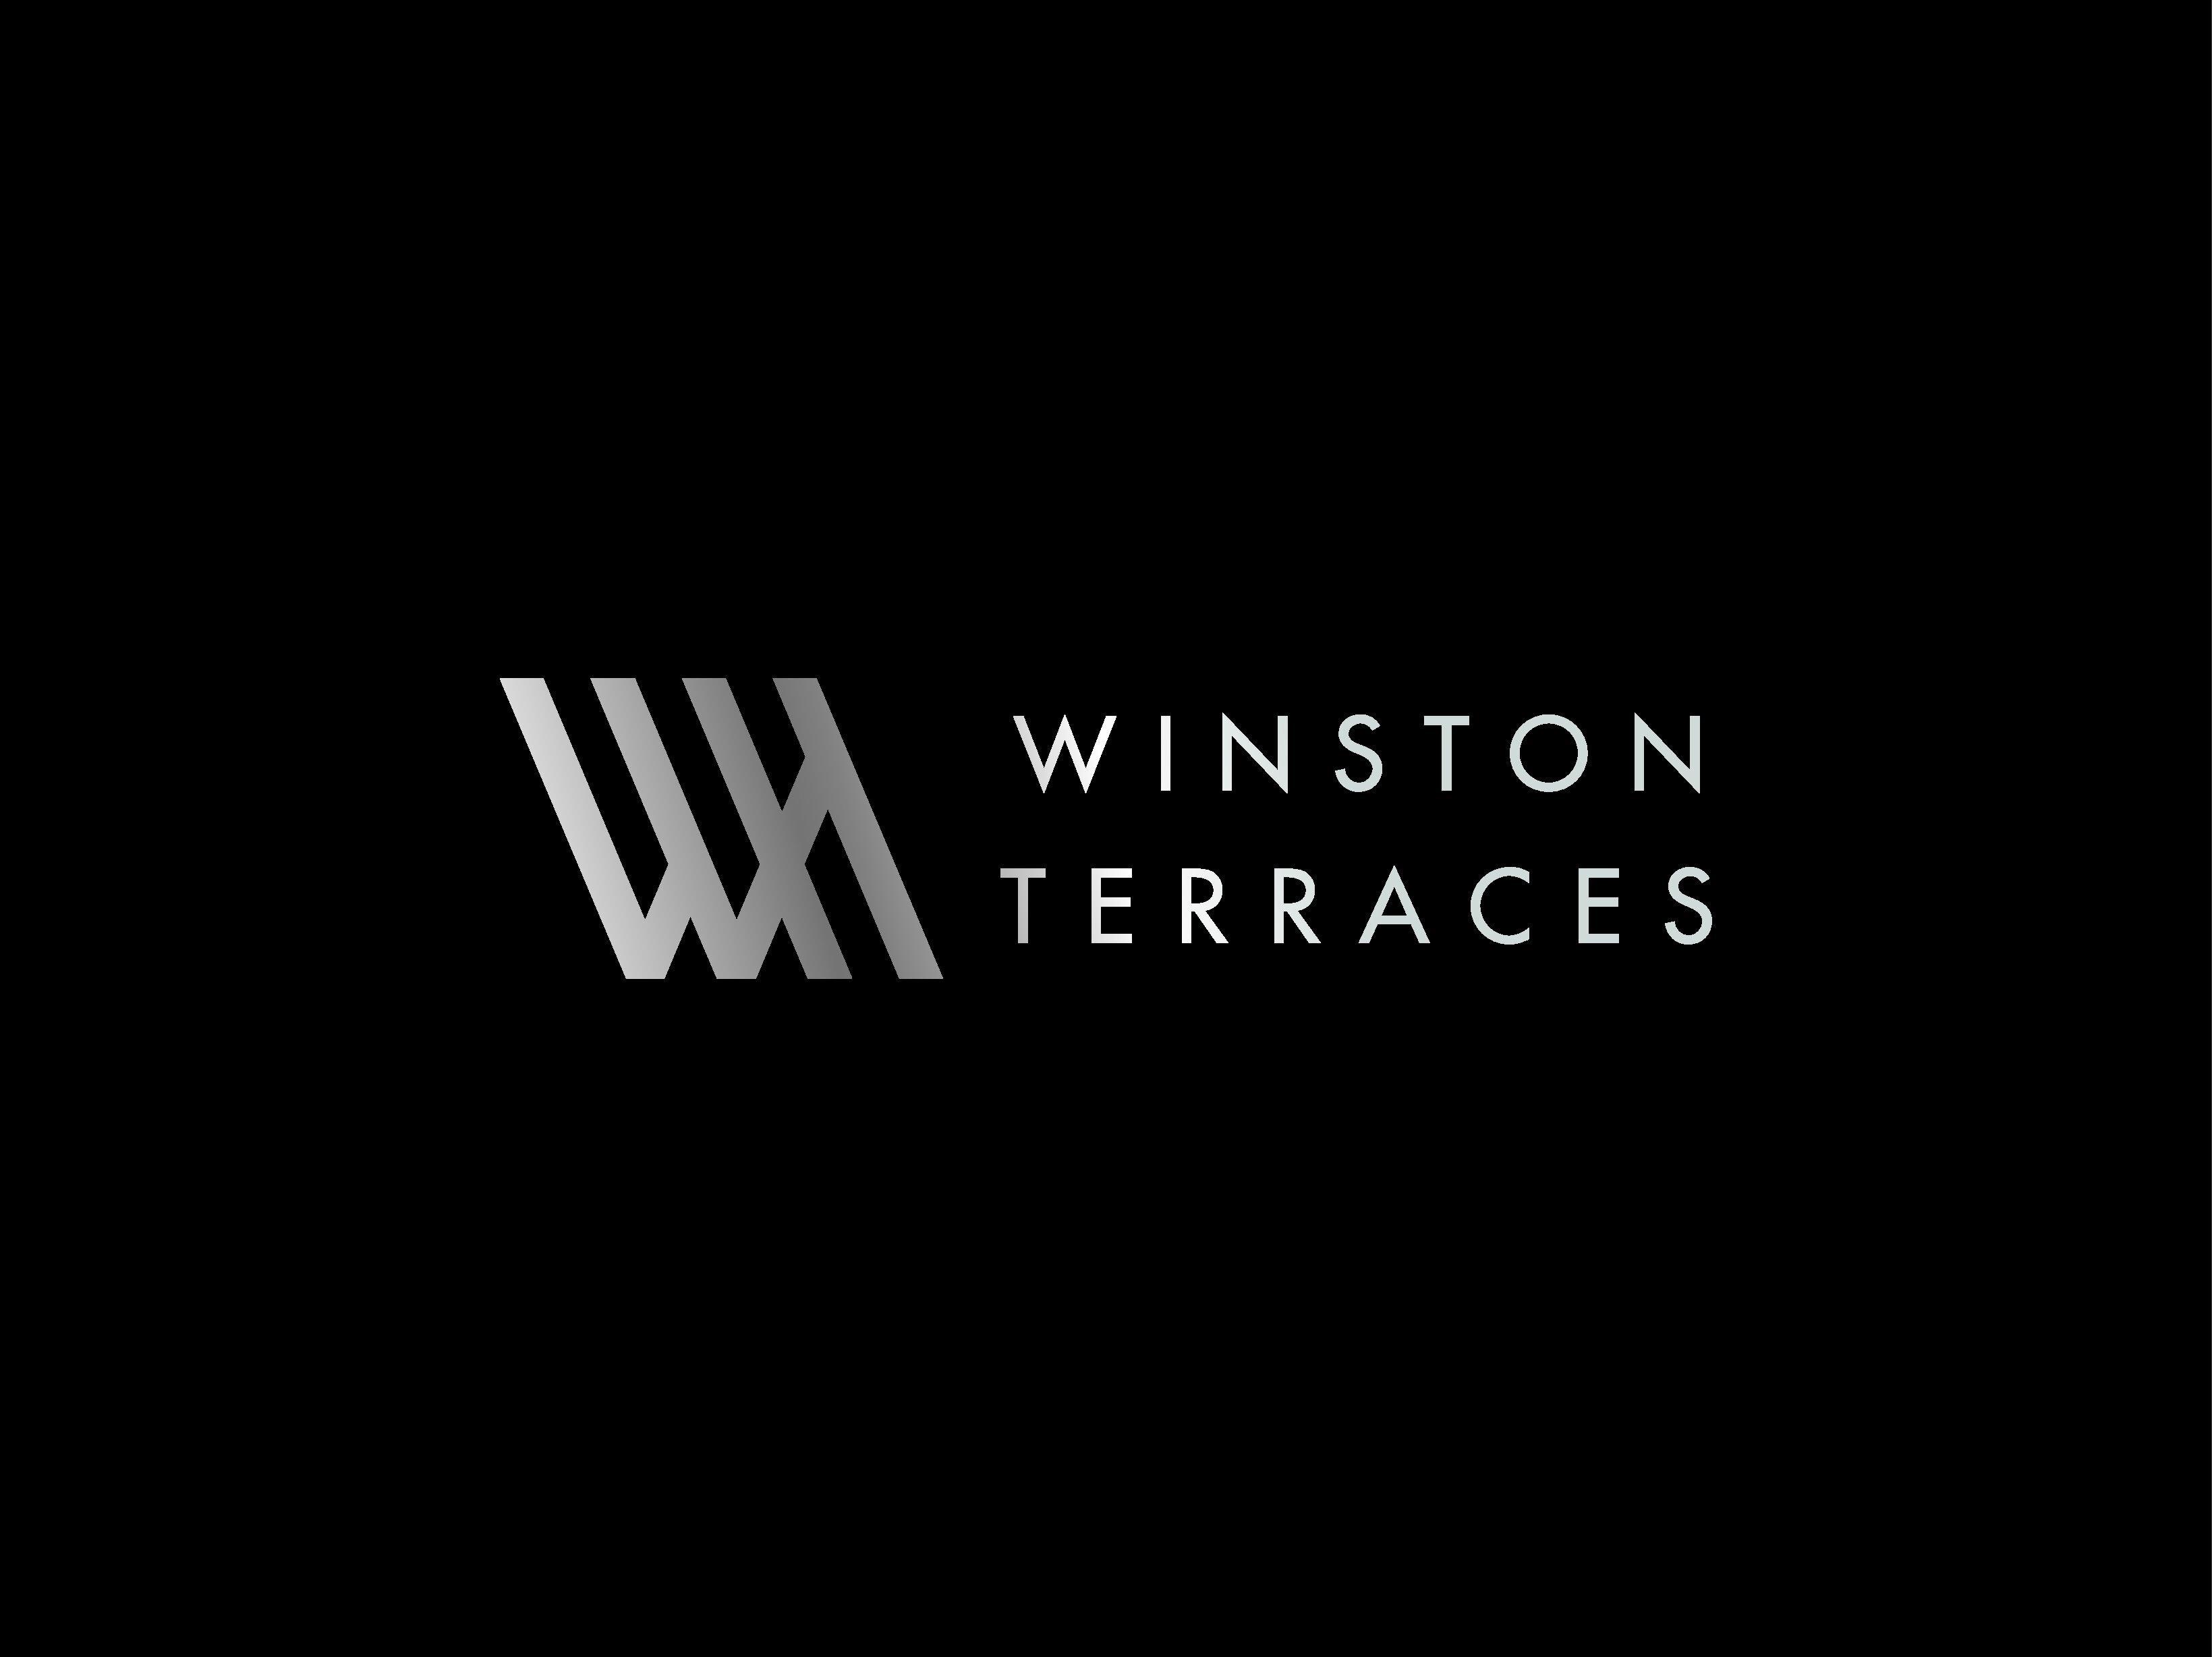 Winston Terraces